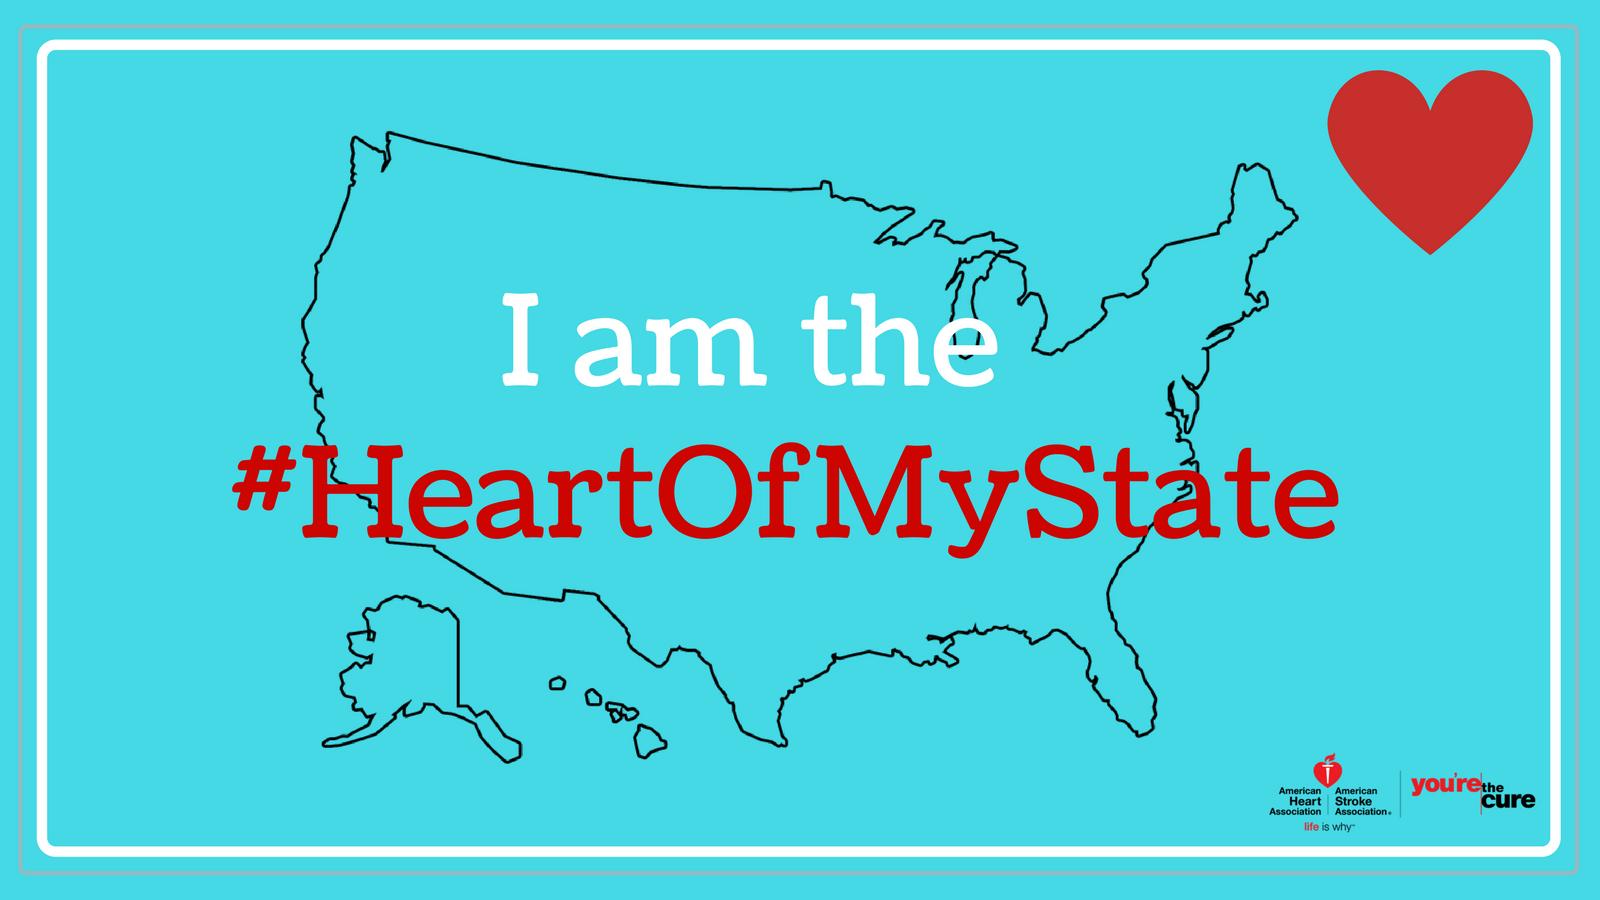 #HeartOfMyState